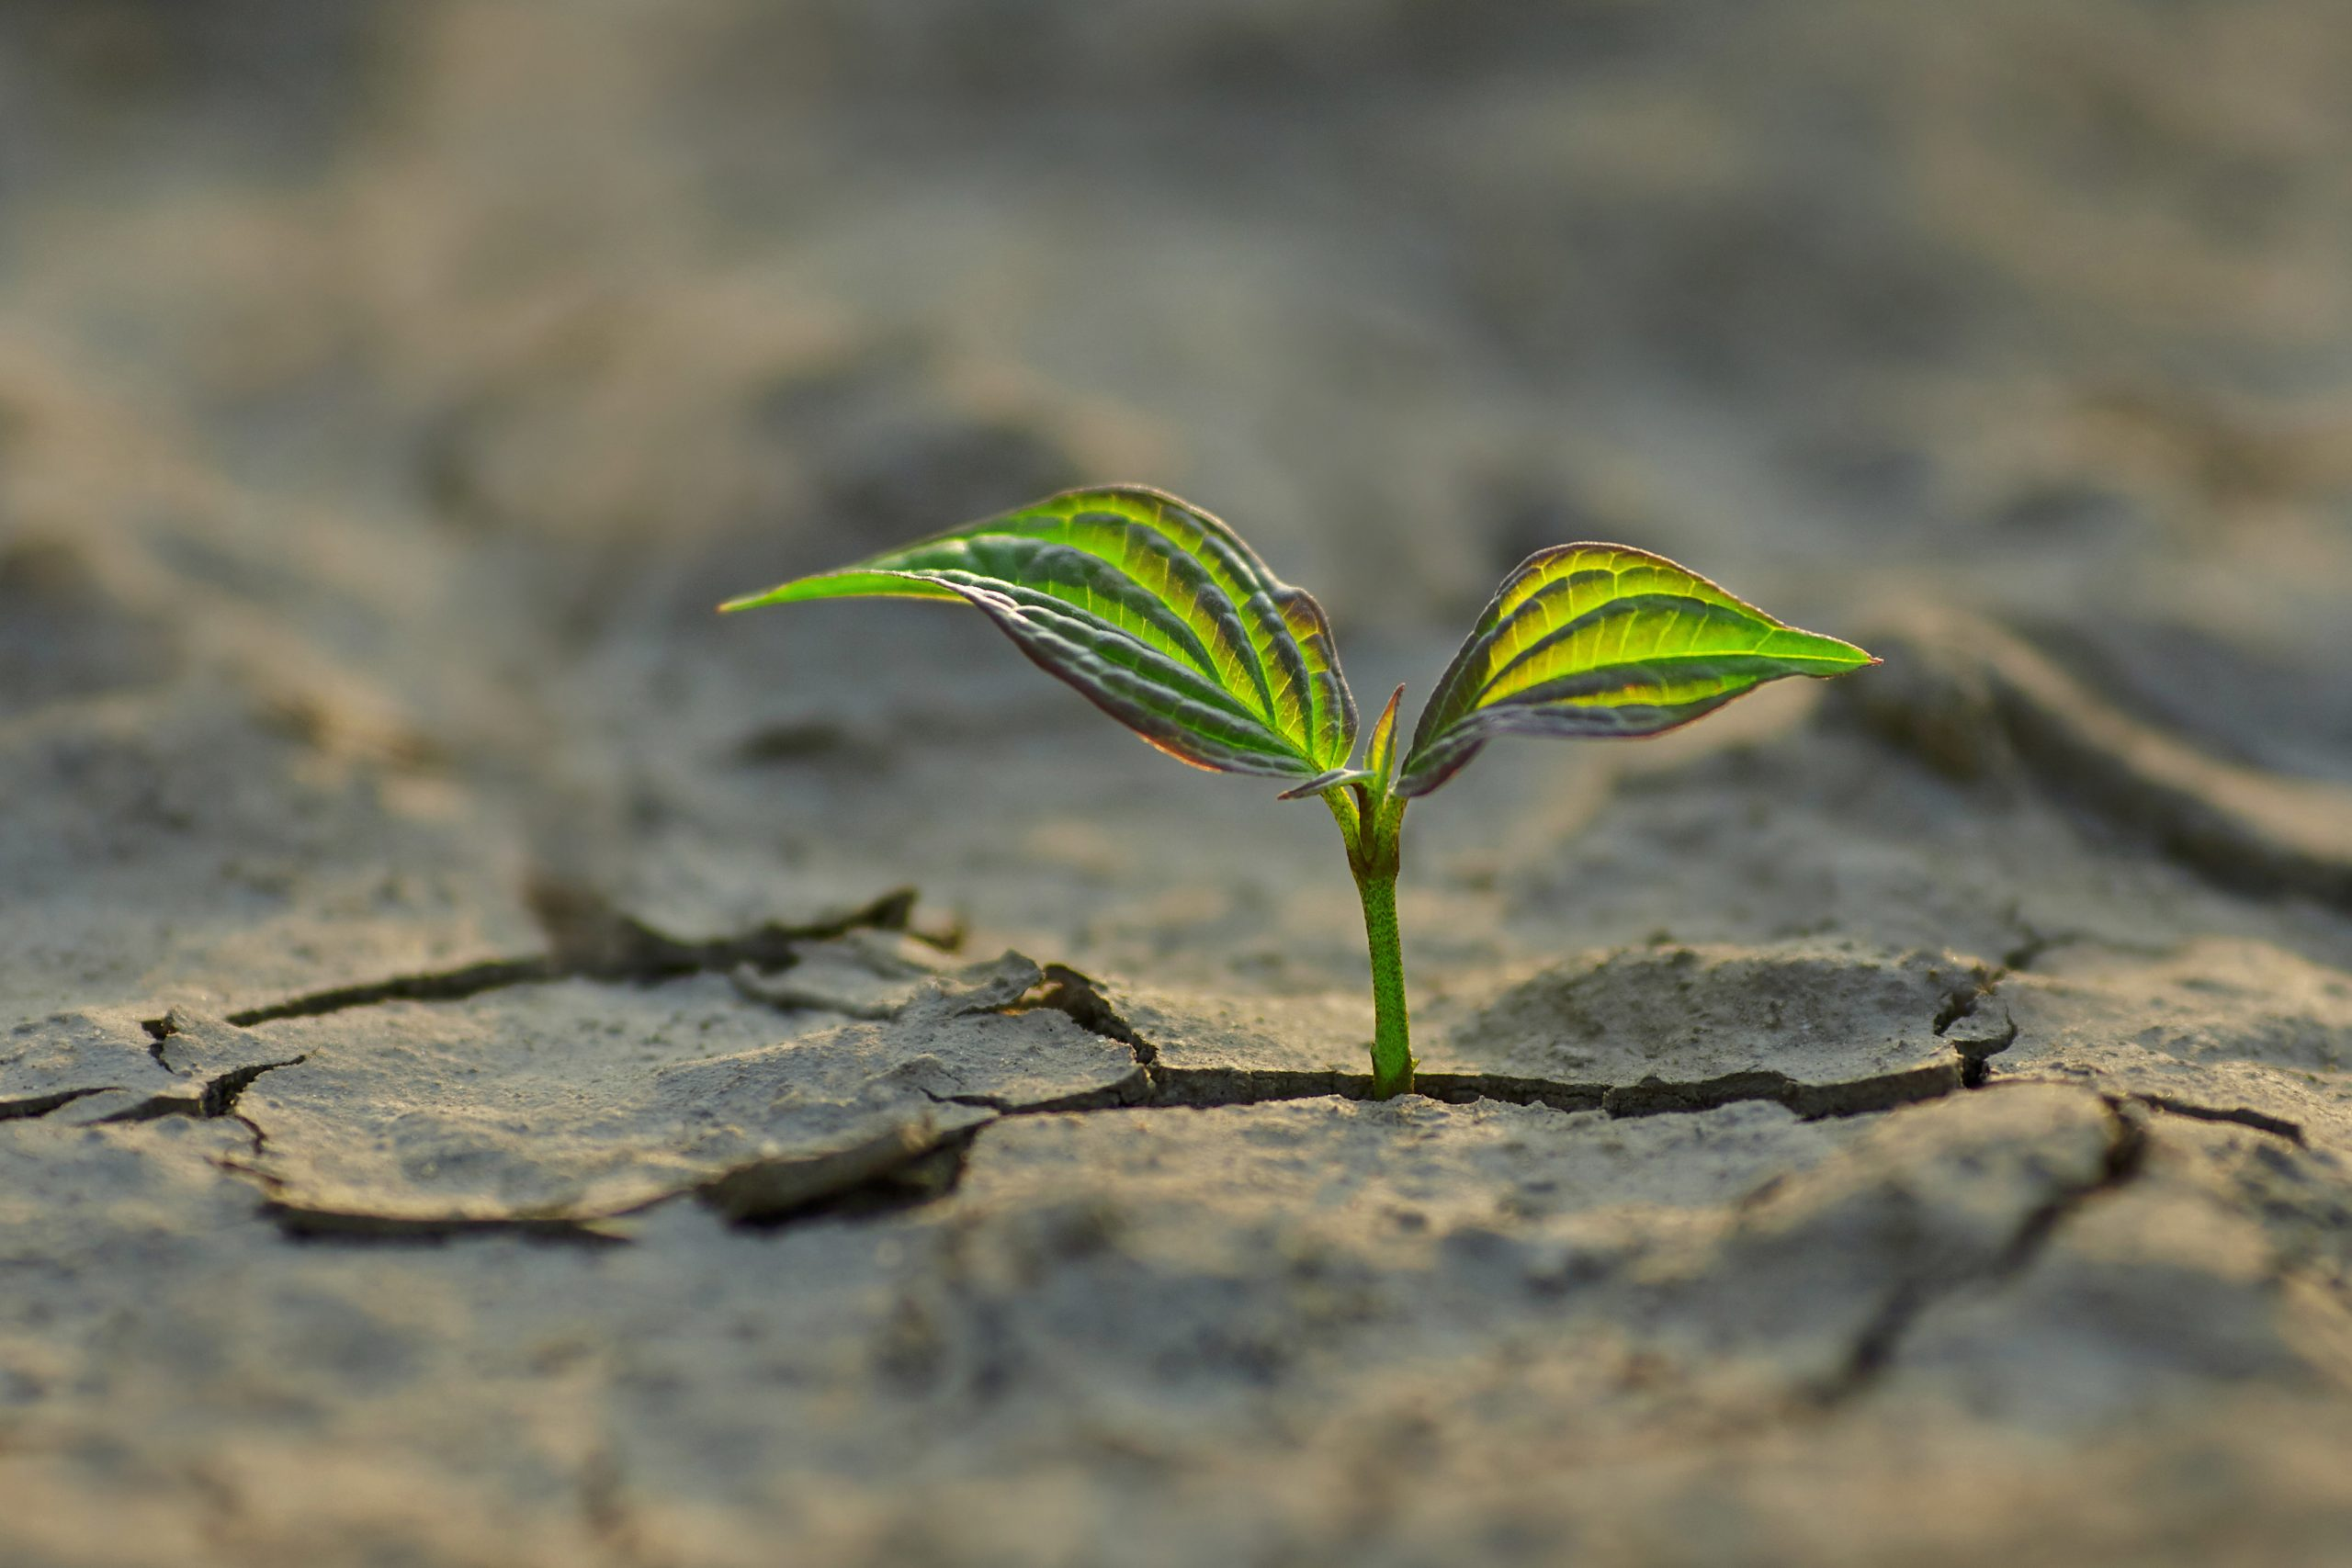 LimburgToekomstbestendig: Subsidie voor slimme, duurzame en/of gezonde innovaties